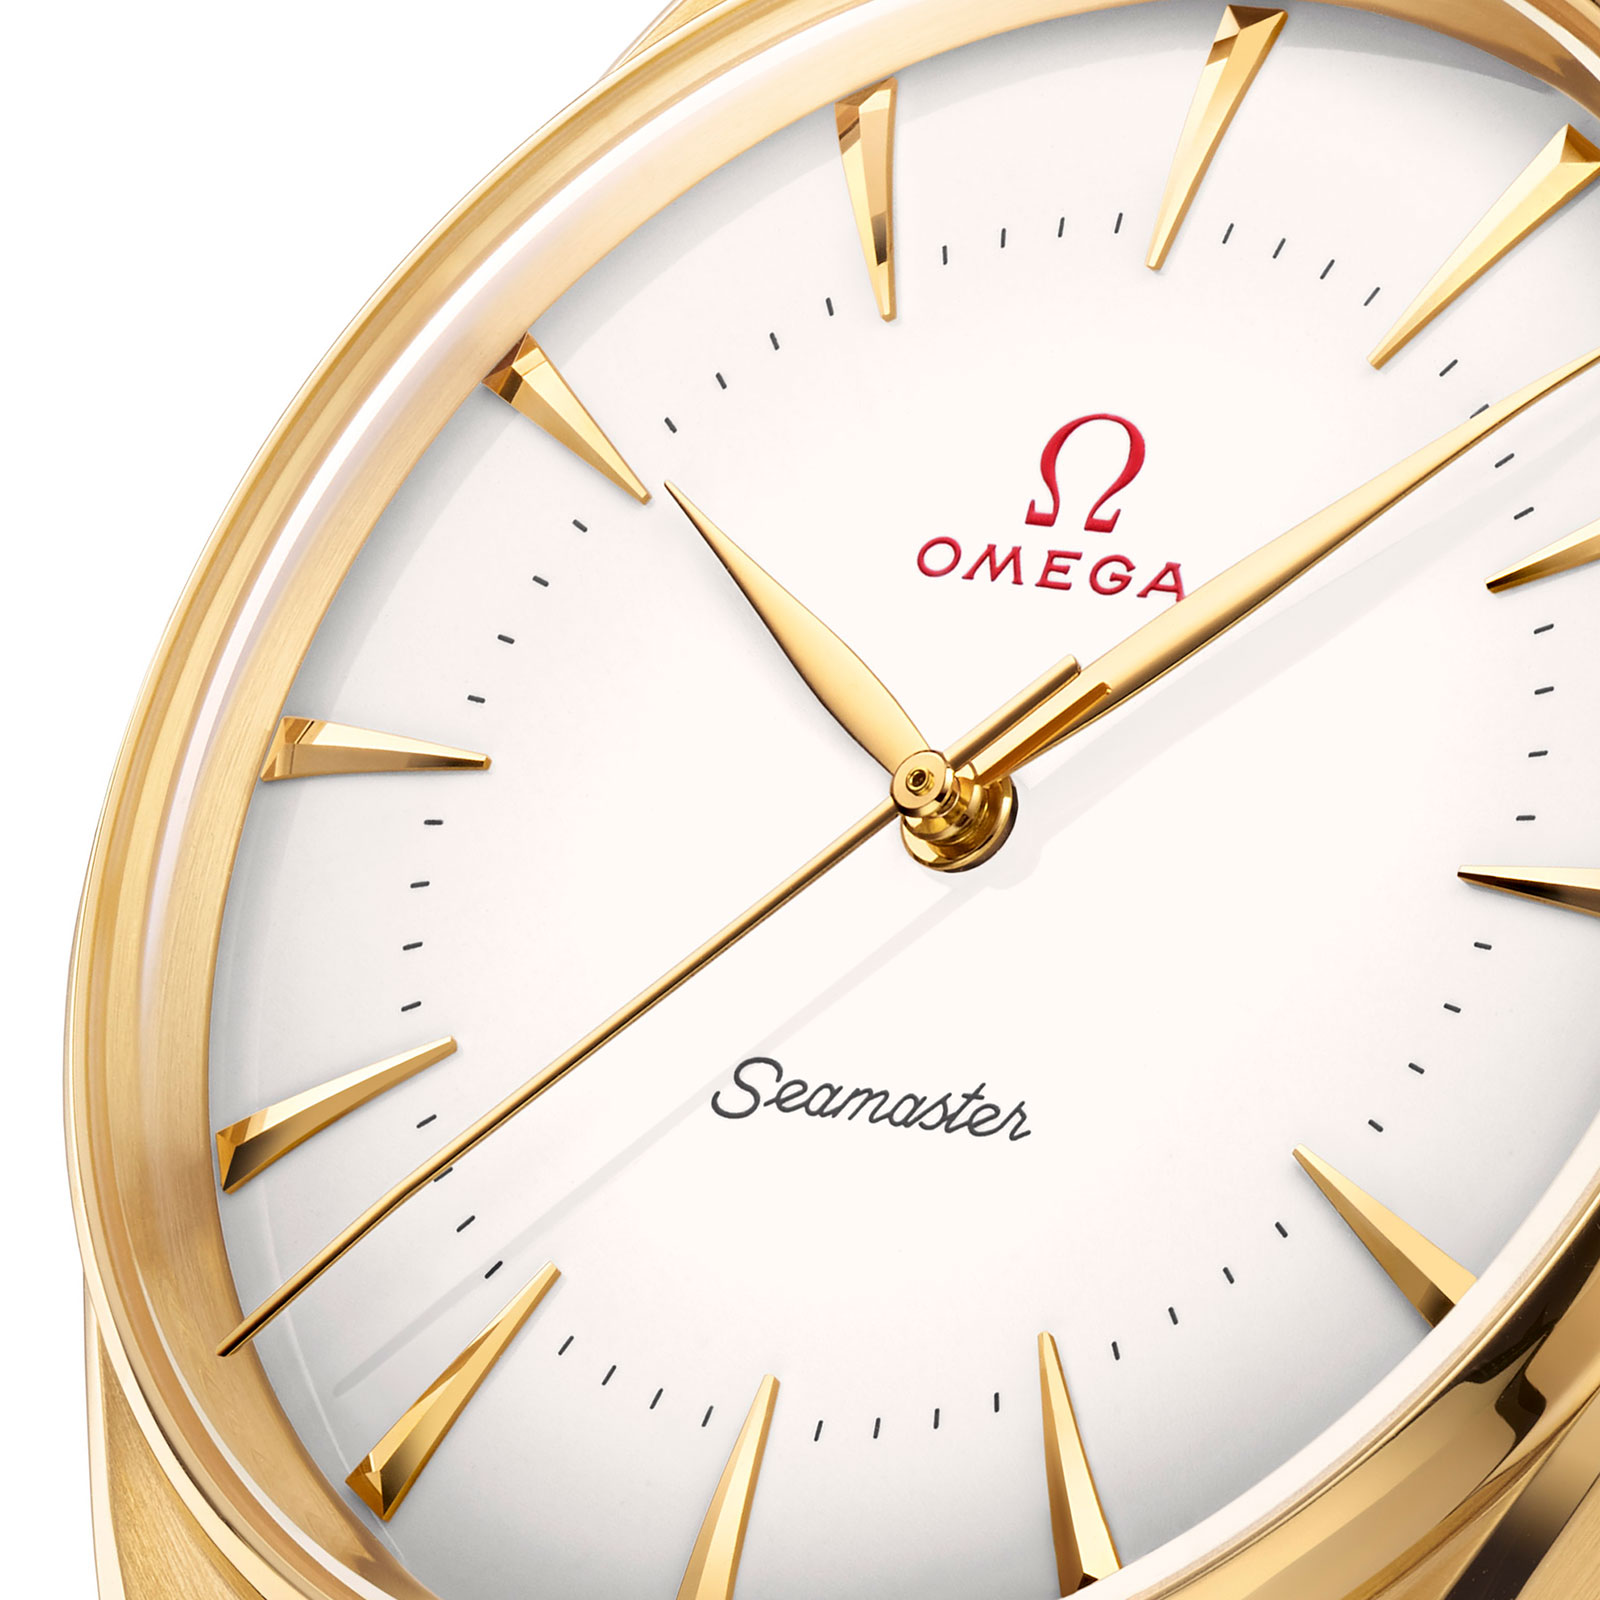 Seamaster-Olympic-Games-Gold enamel dial